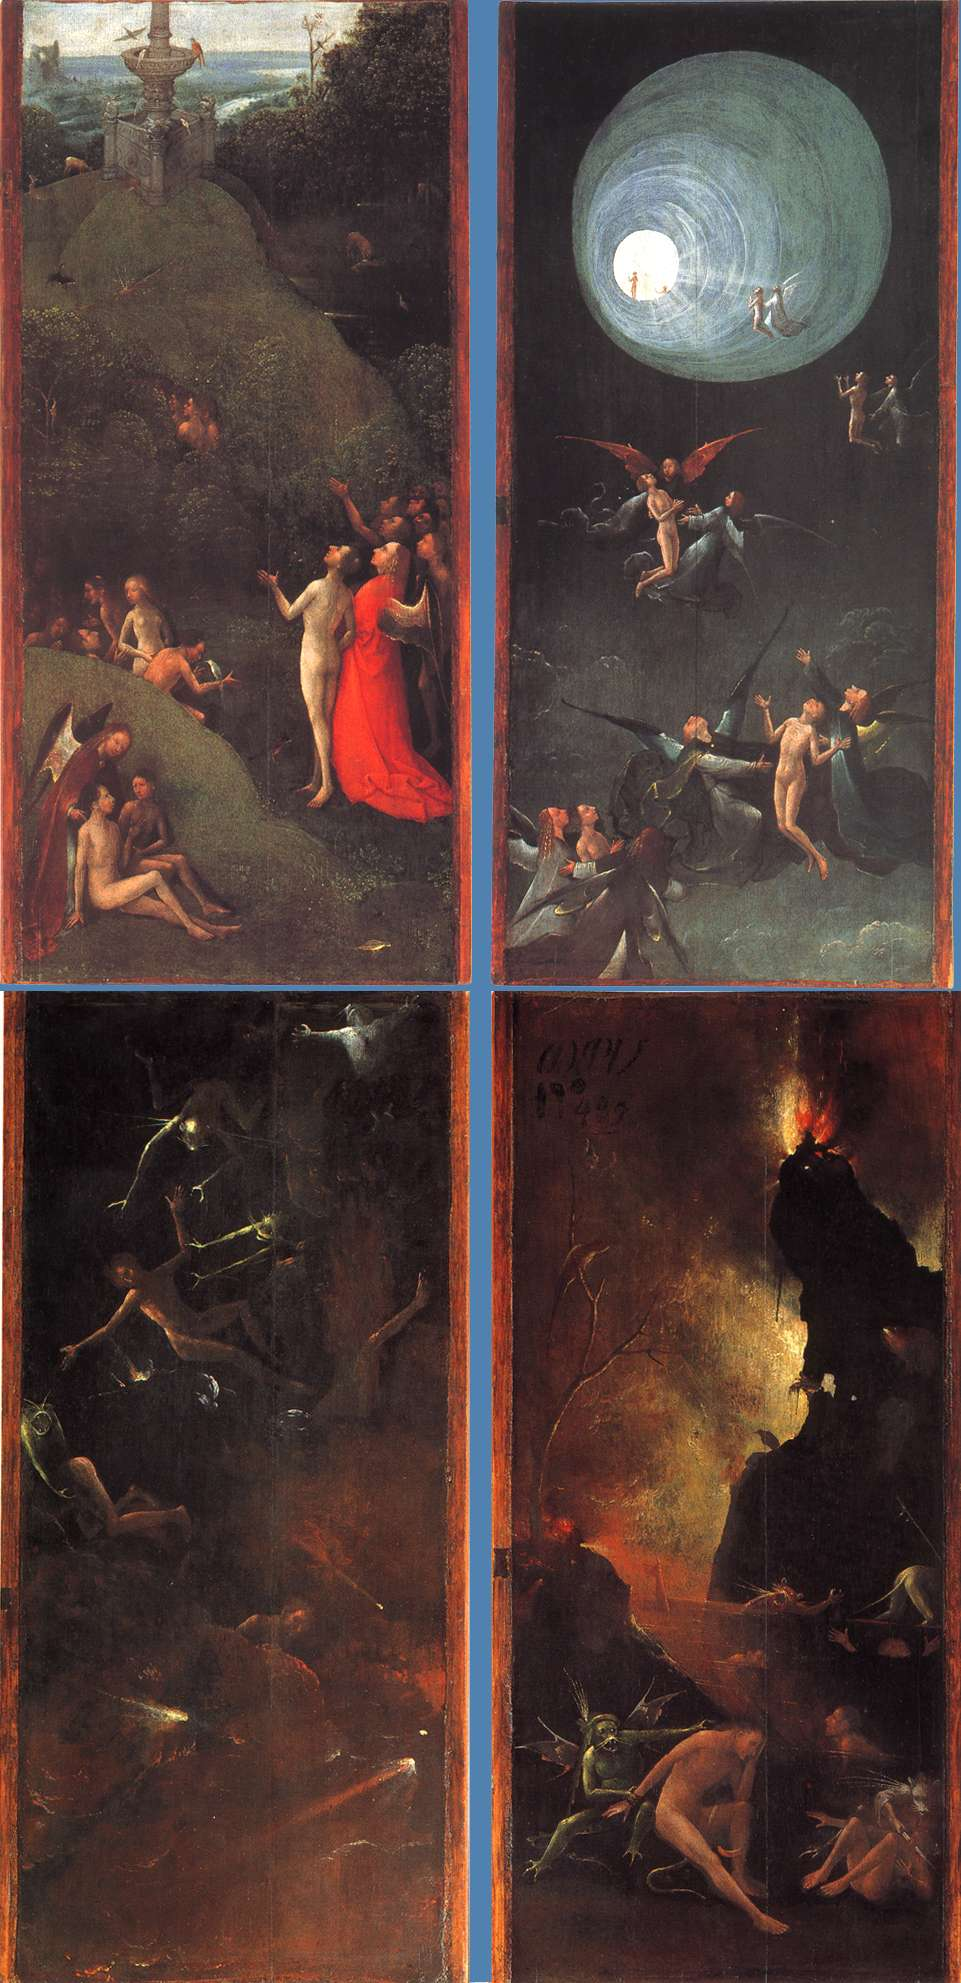 http://upload.wikimedia.org/wikipedia/commons/4/44/The_Last_Judgement_2_Bosch.jpg